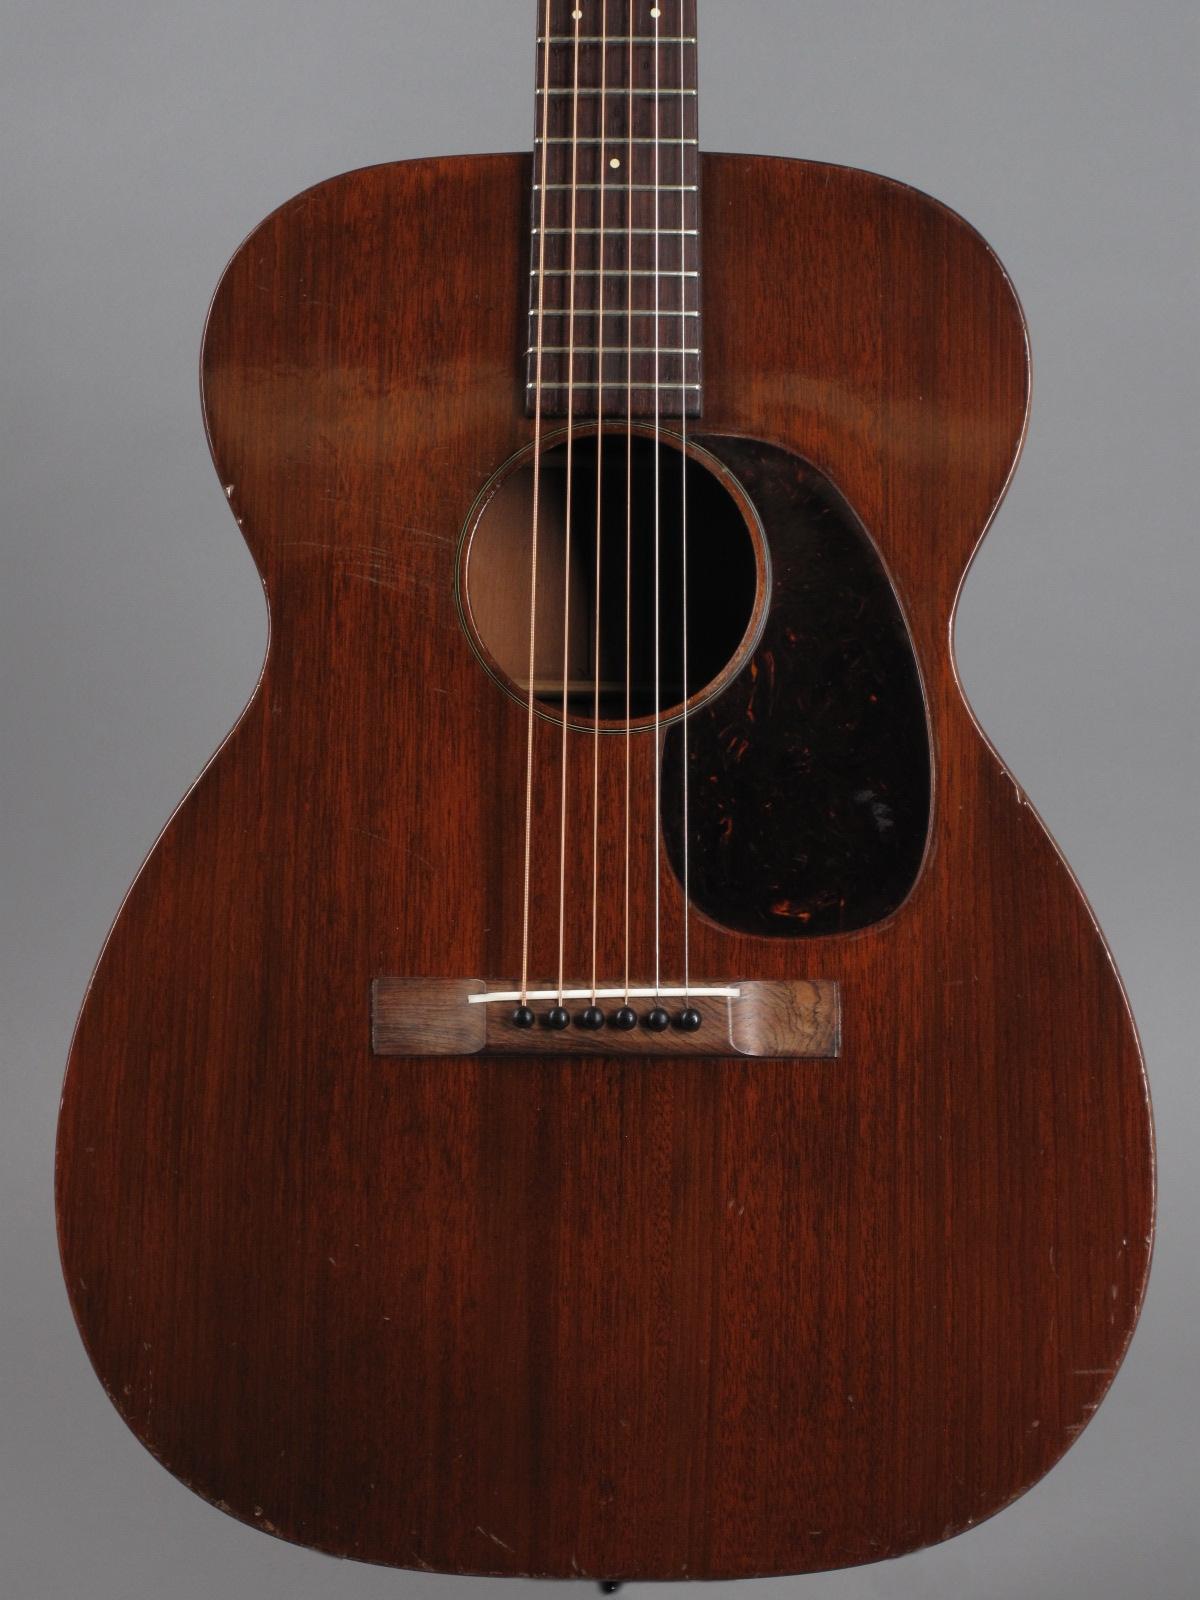 1951 Martin 00-17 - Natural